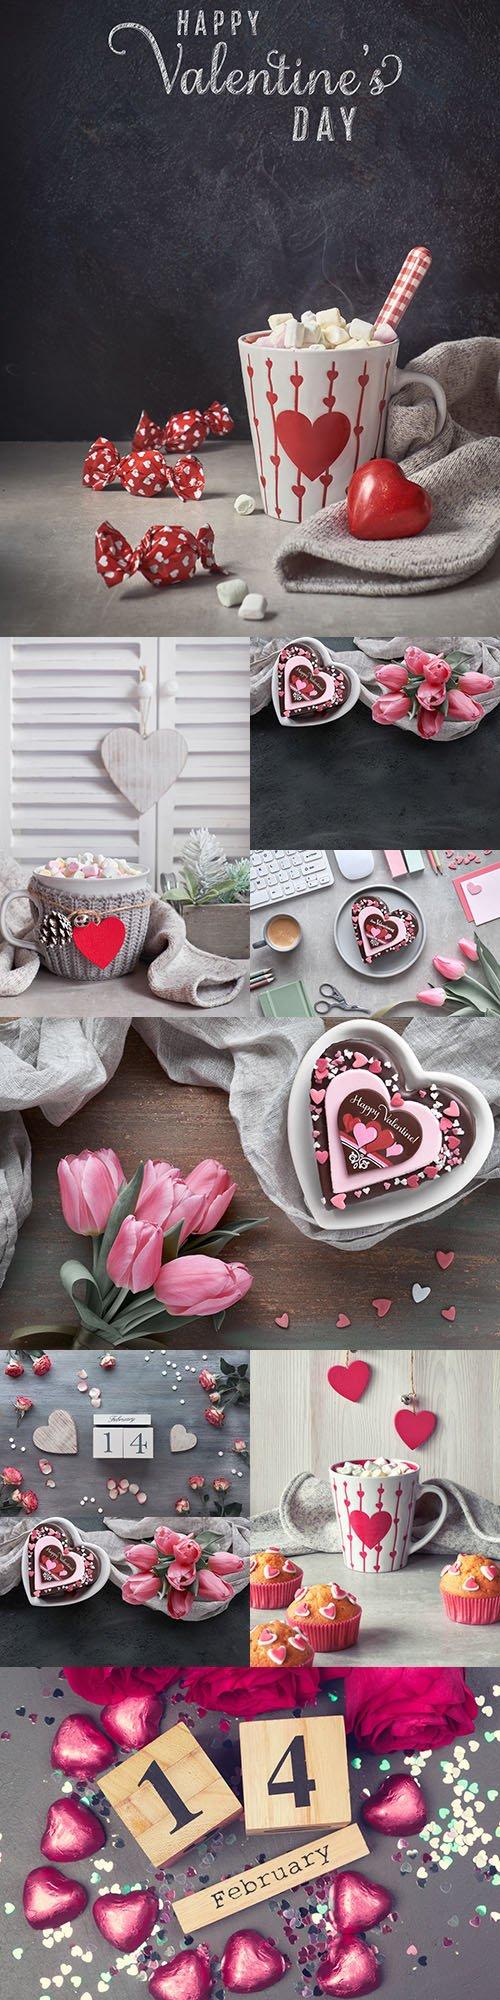 Valentine's Day romantic decorative composition